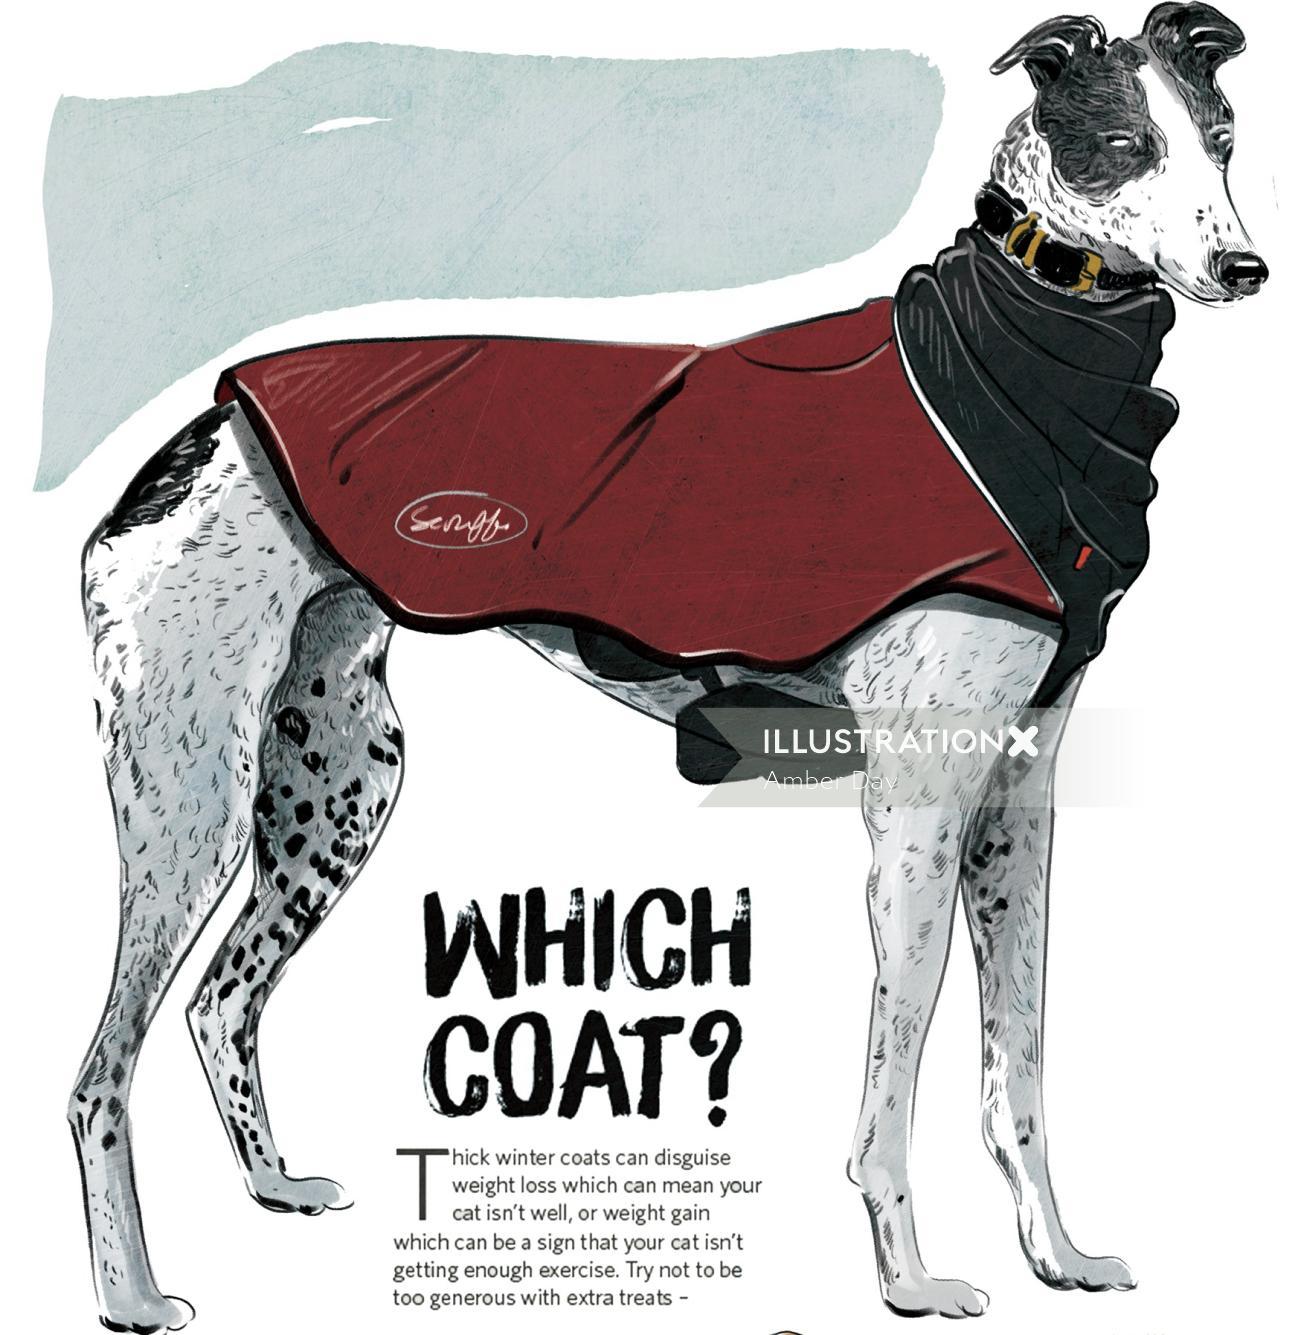 dog, pet, editorial, magazine, fashion, winter